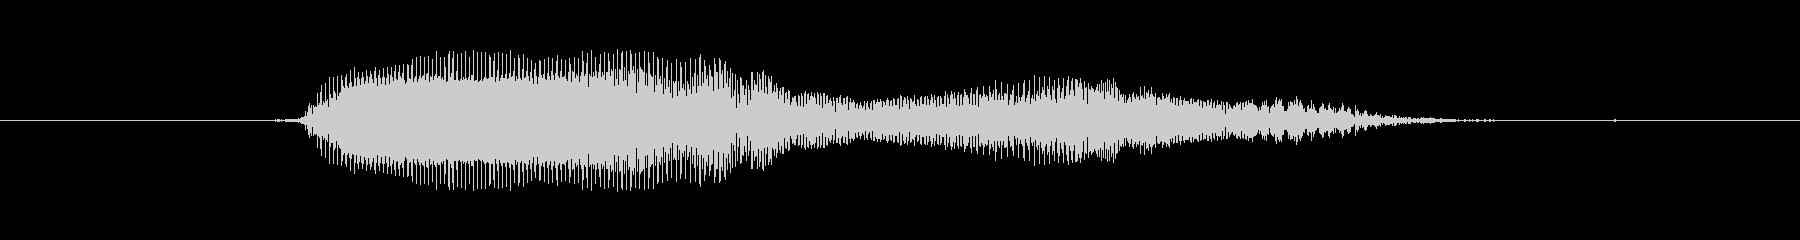 Aa's unreproduced waveform